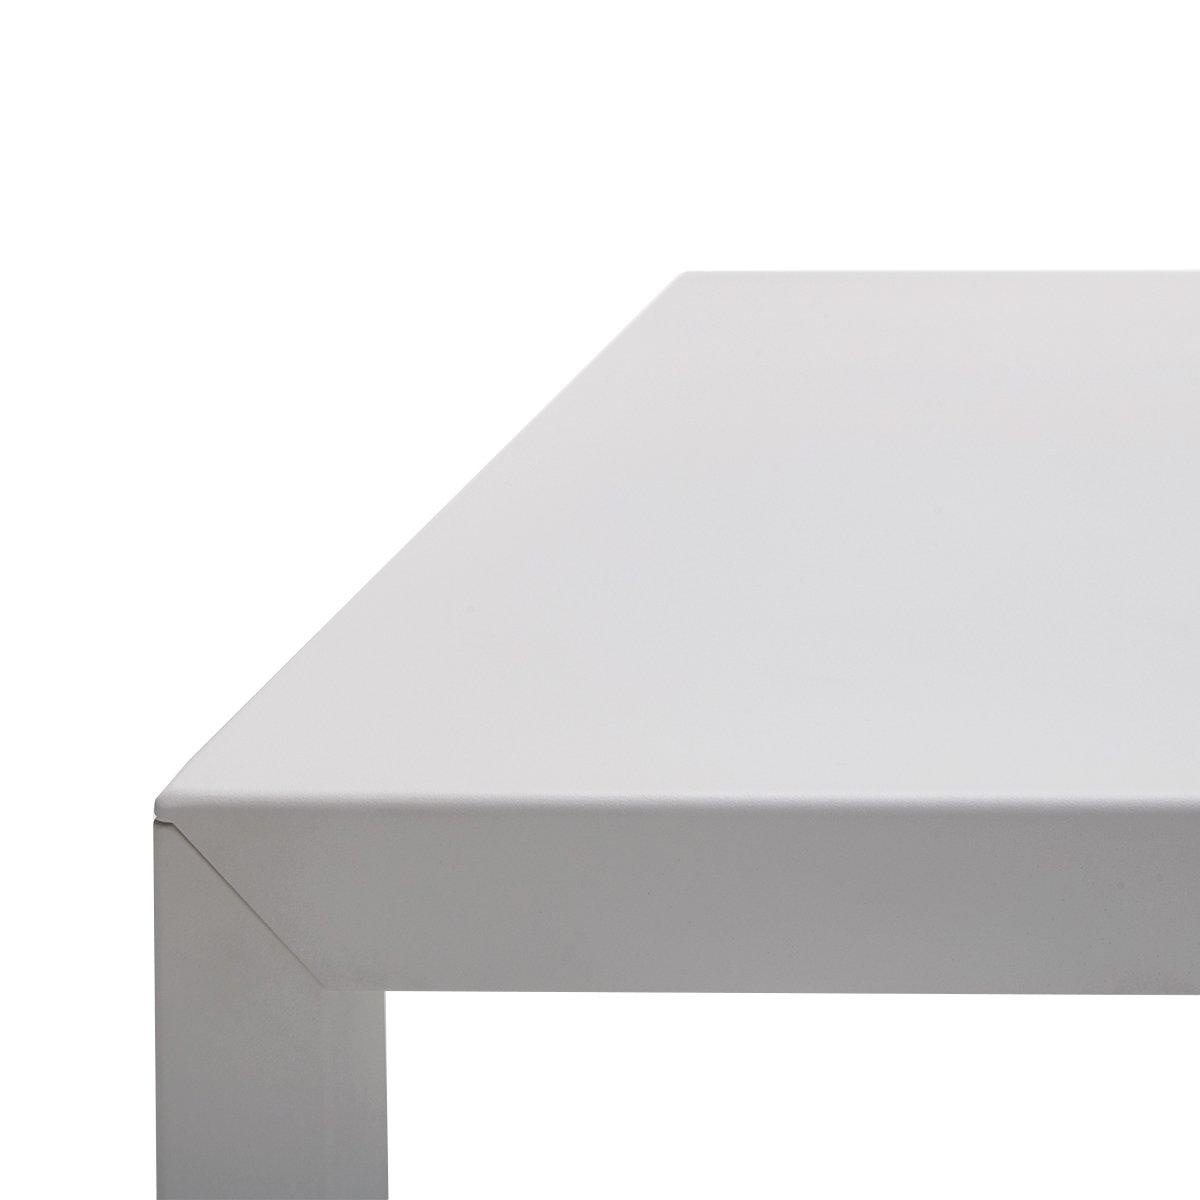 MDF Italia Tense Eettafel Outdoor - 180x90 - Wit